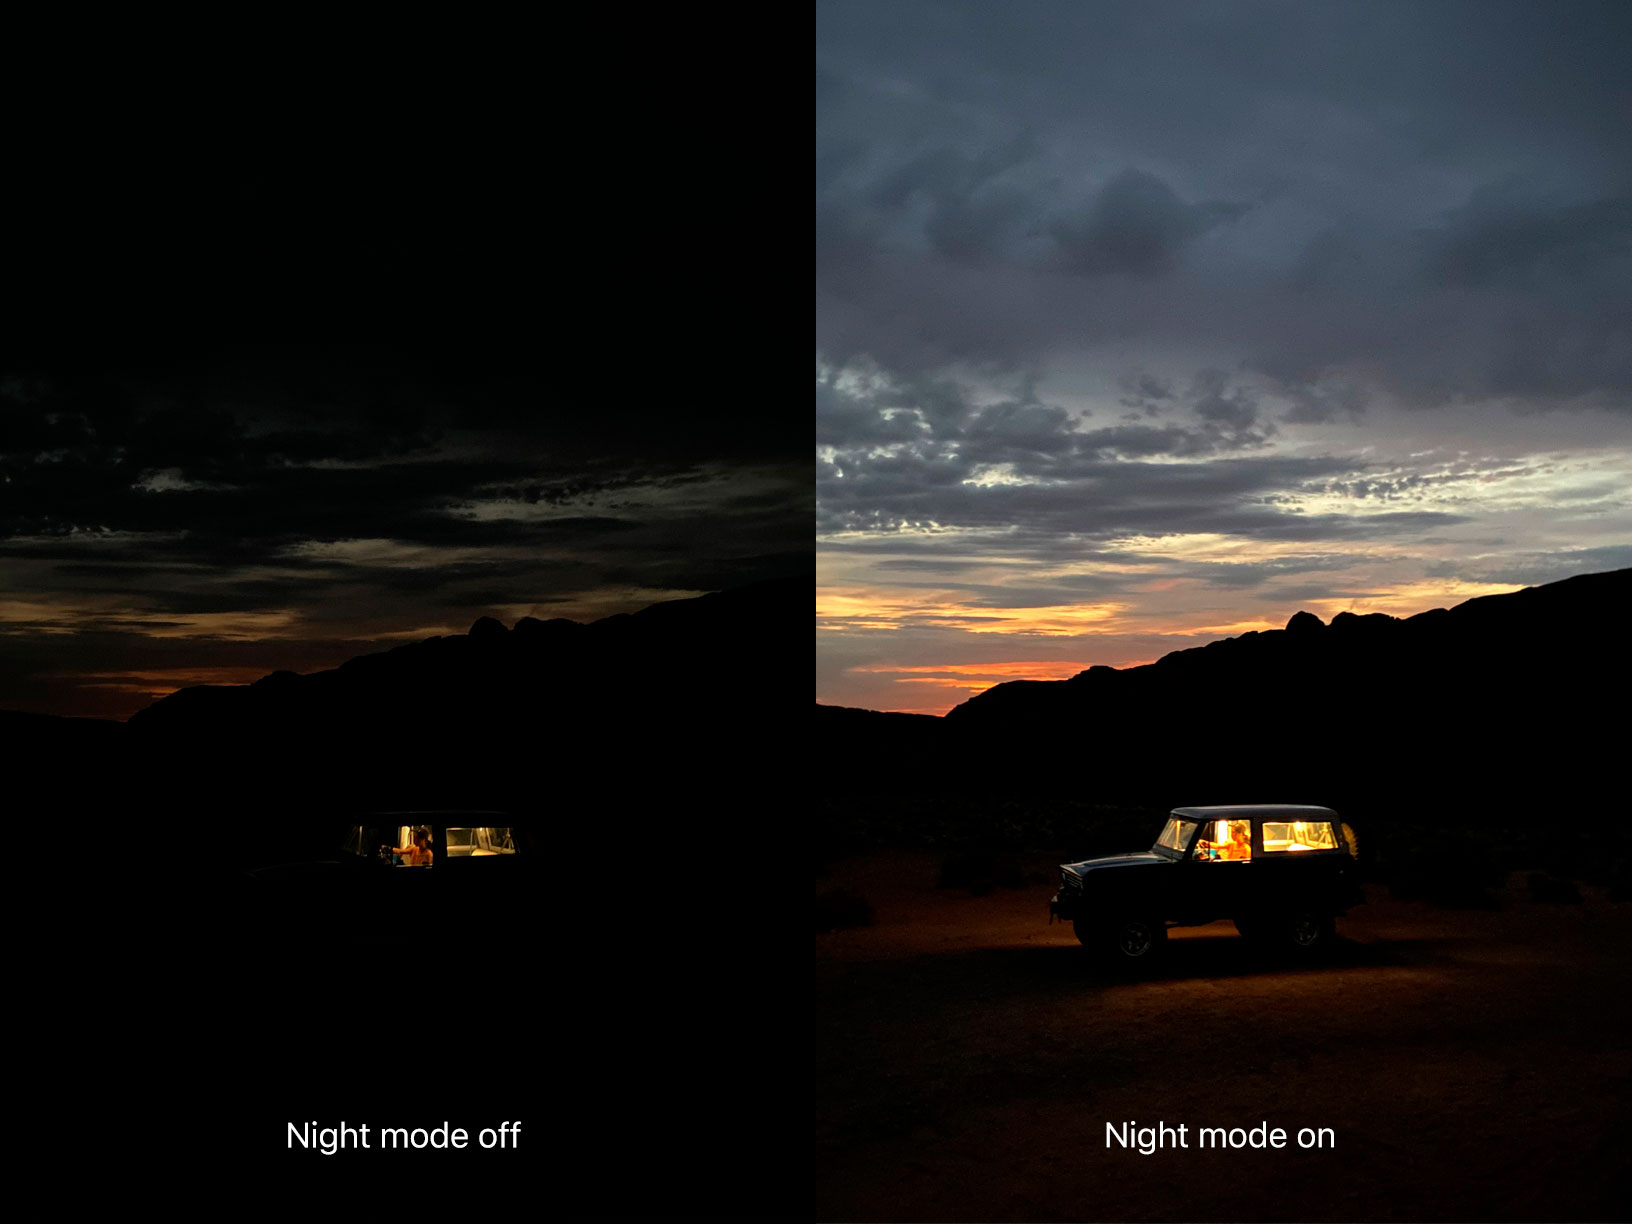 https://www.macfreak.nl/modules/news/images/zArt.iPhone11Pro_NightMode_091019.jpg